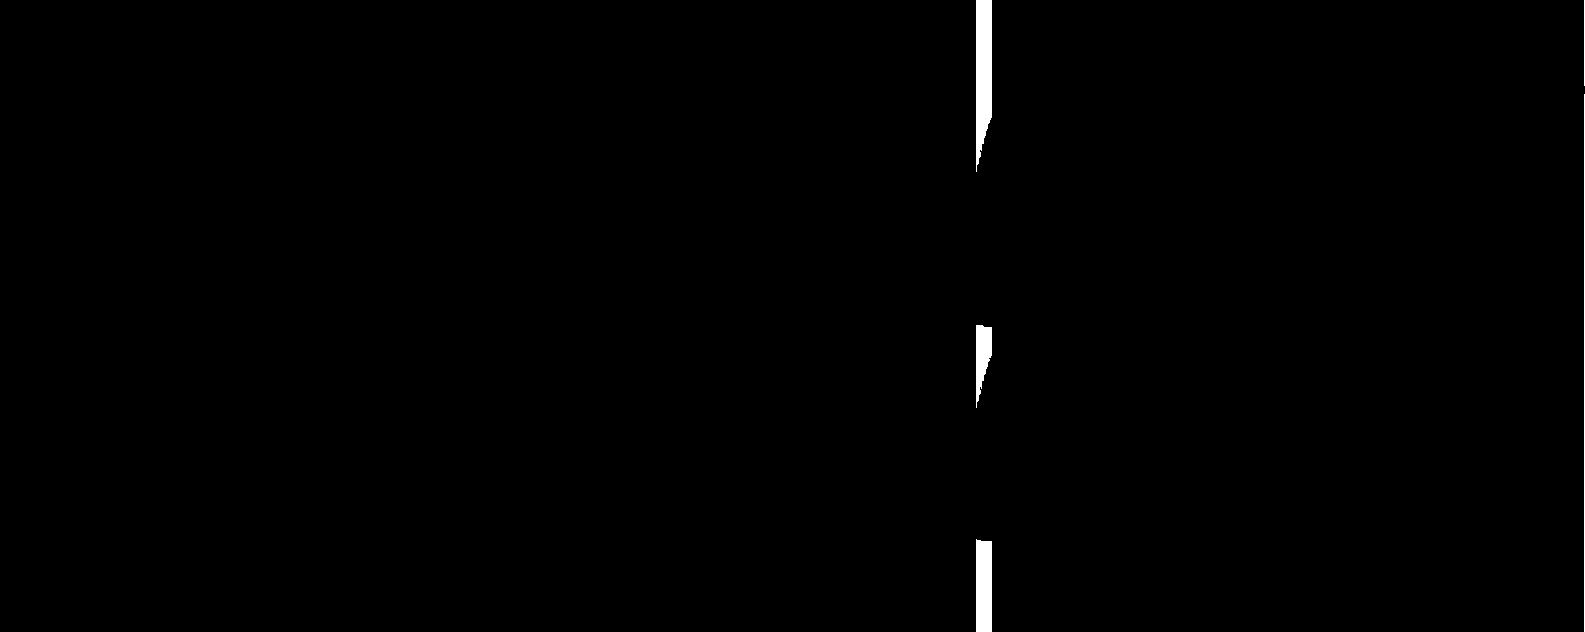 RTMP astro black_logo.png